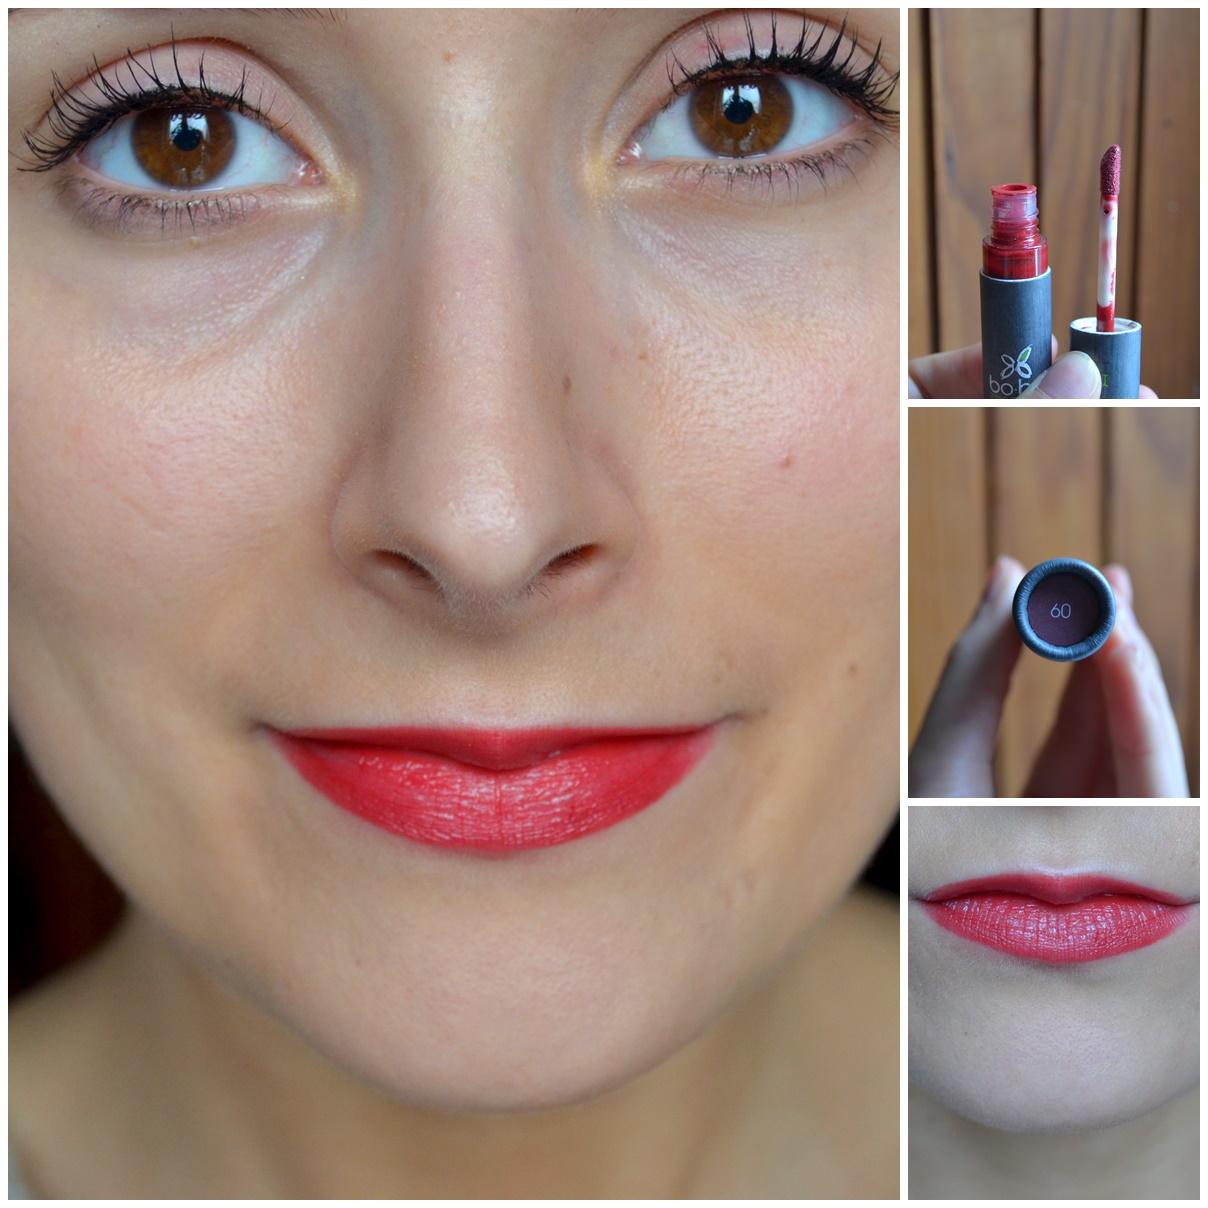 maquillage boho cosmetics gloss teinte 09